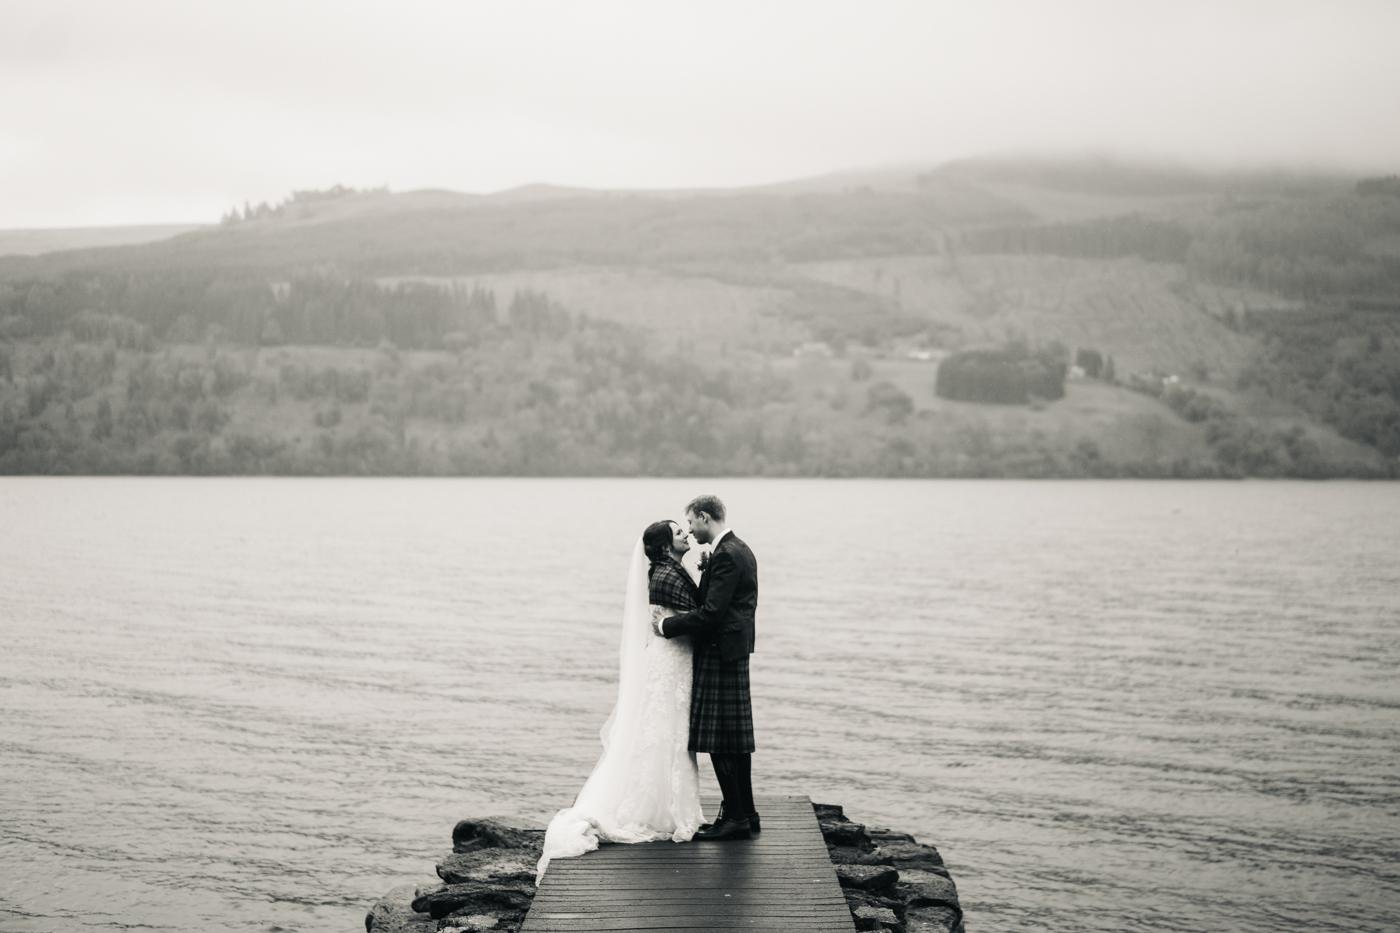 scottish-wedding-trossachs-loch-tay-highlannds-relaxed-photography-photographer-0040.jpg